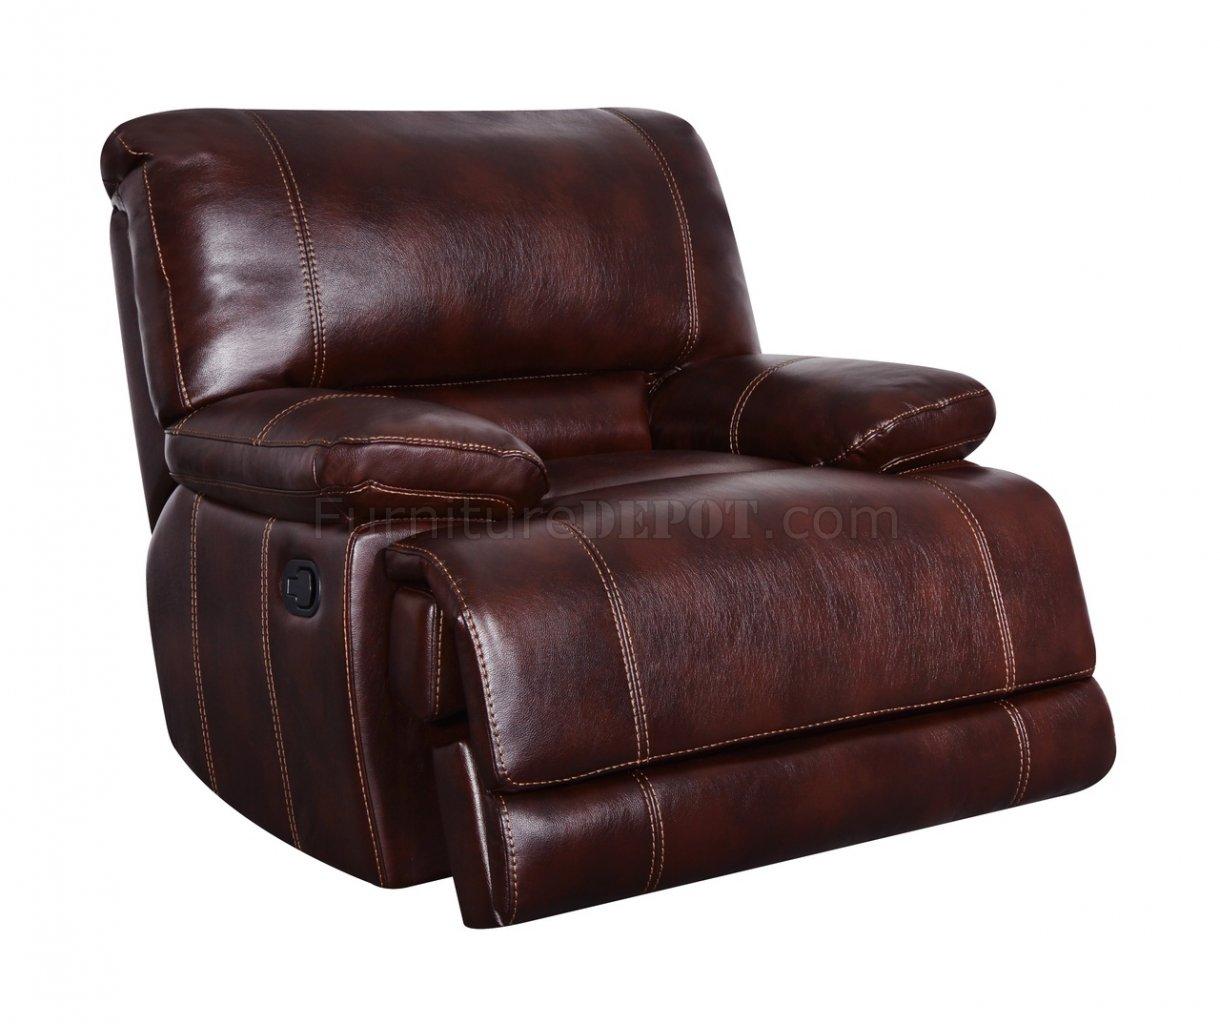 espresso bonded leather reclining sofa loveseat set for bay window u1953 in coffee global